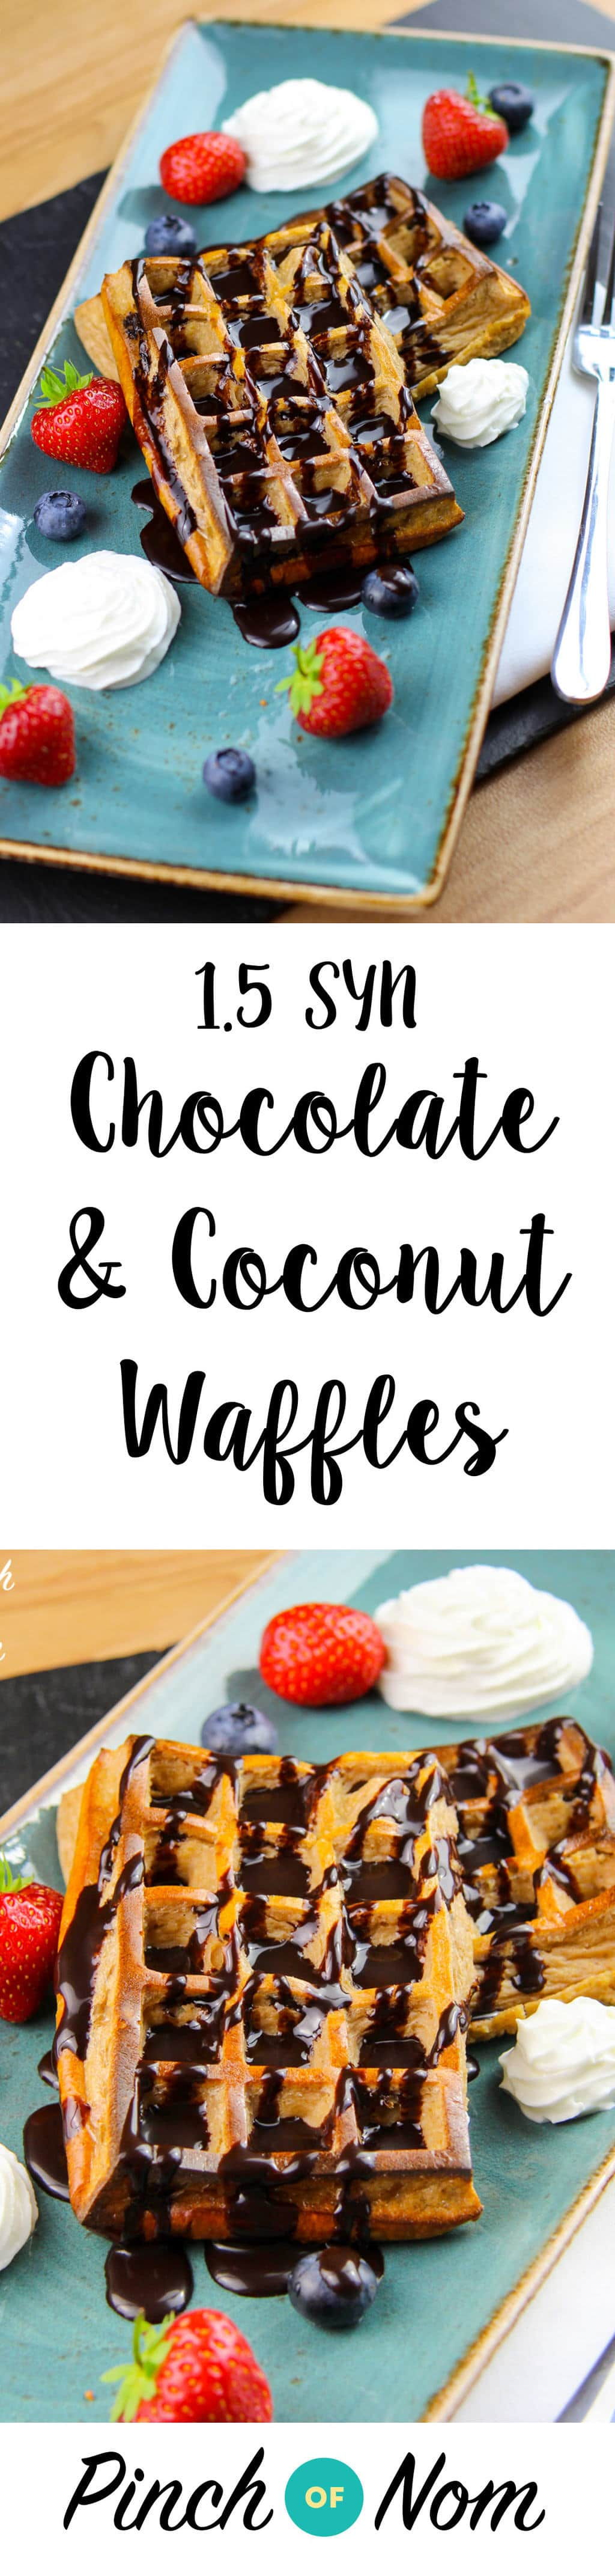 coconut-waffles